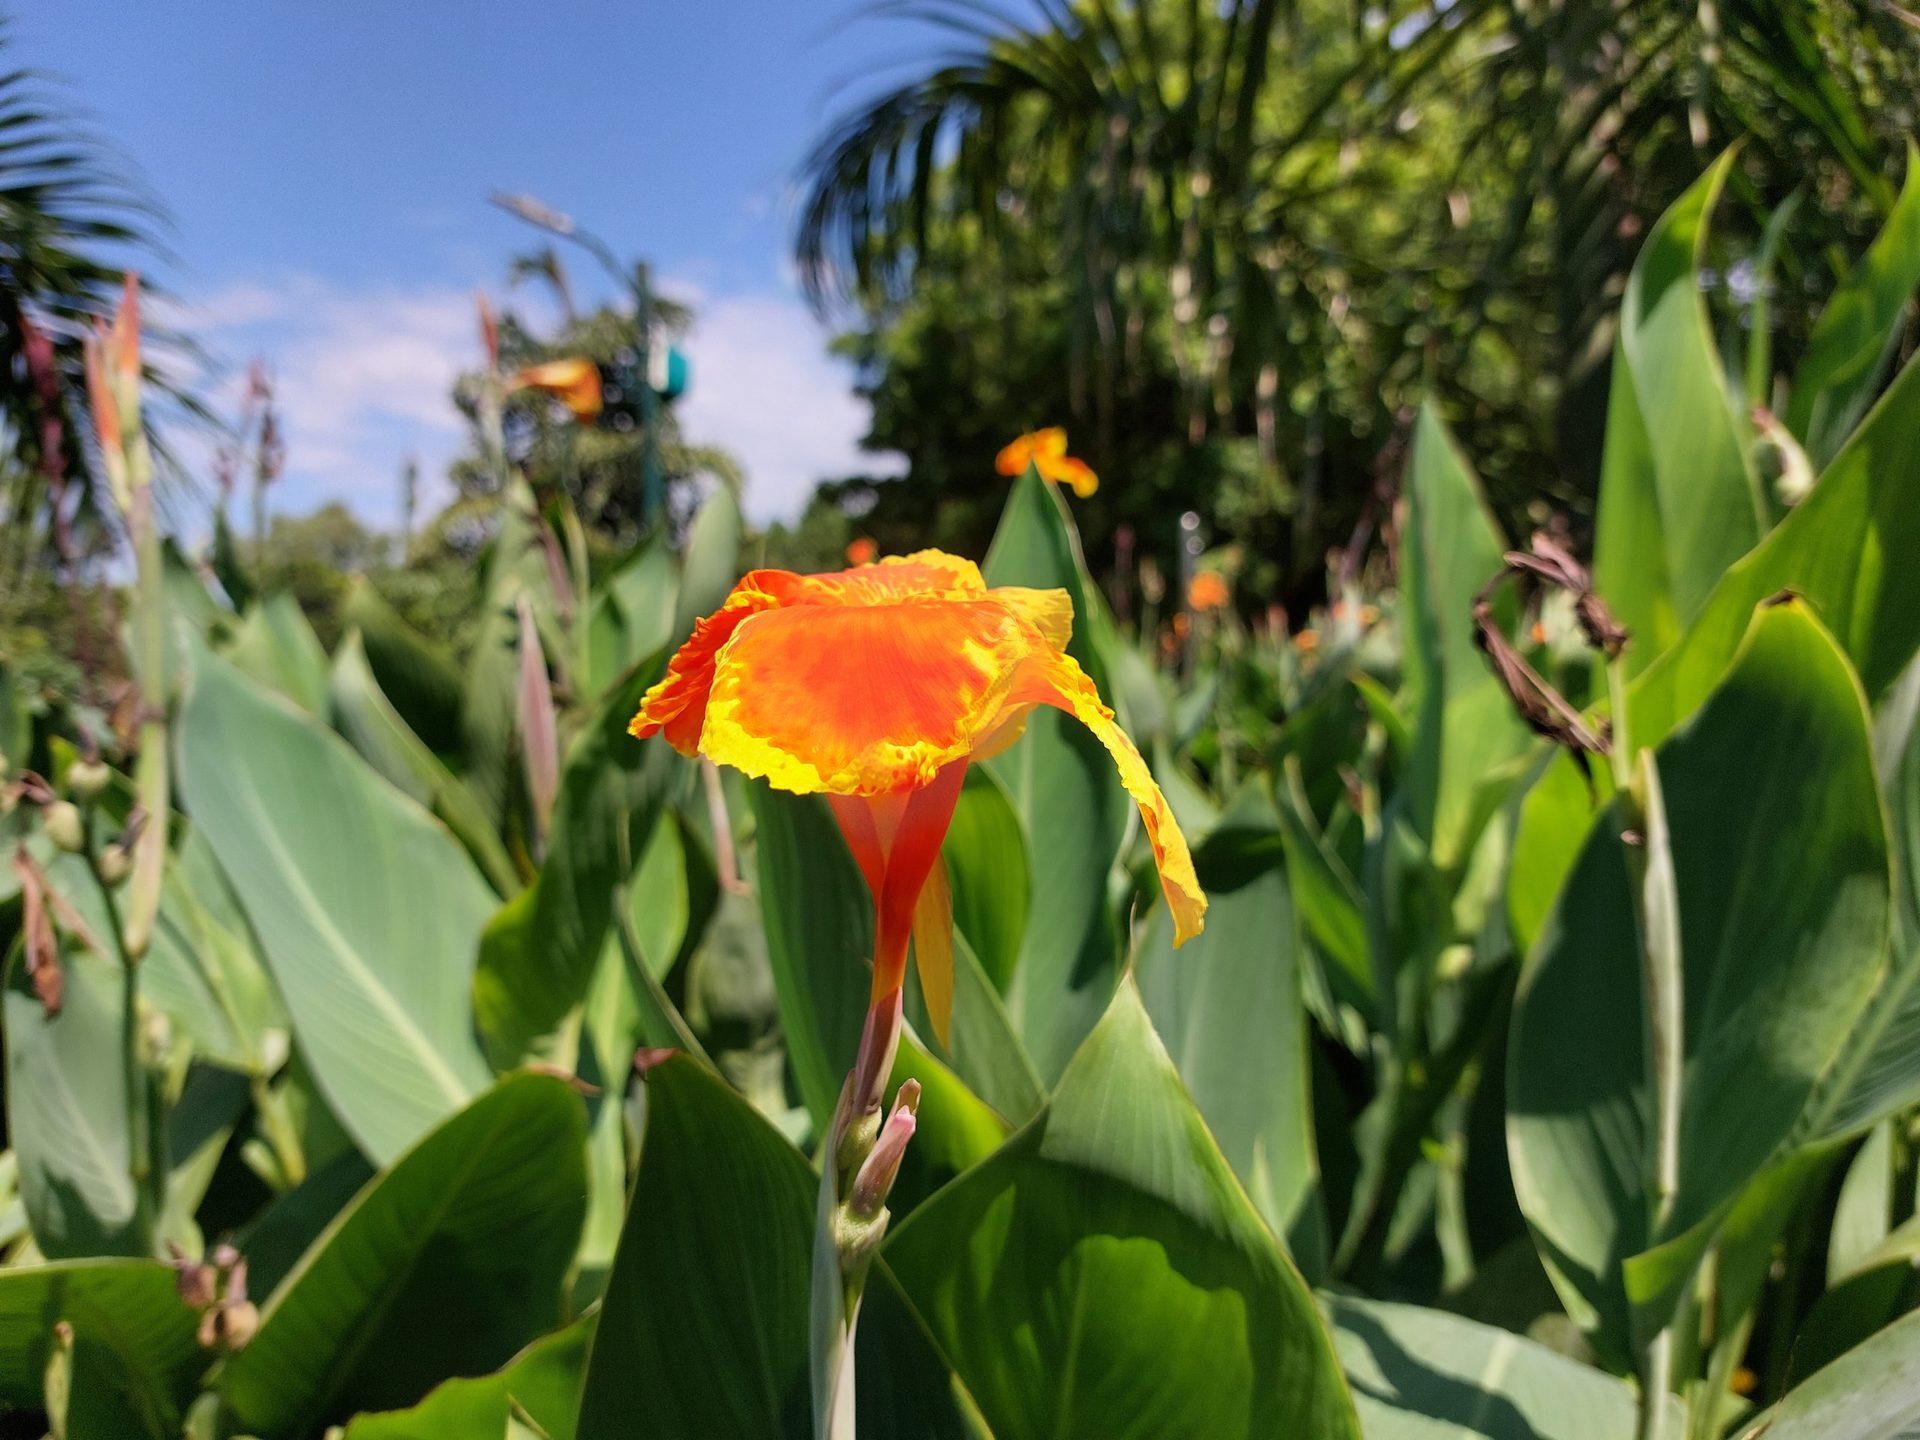 Samsung Galaxy A52s 5G rear camera shot of orange and green flower.